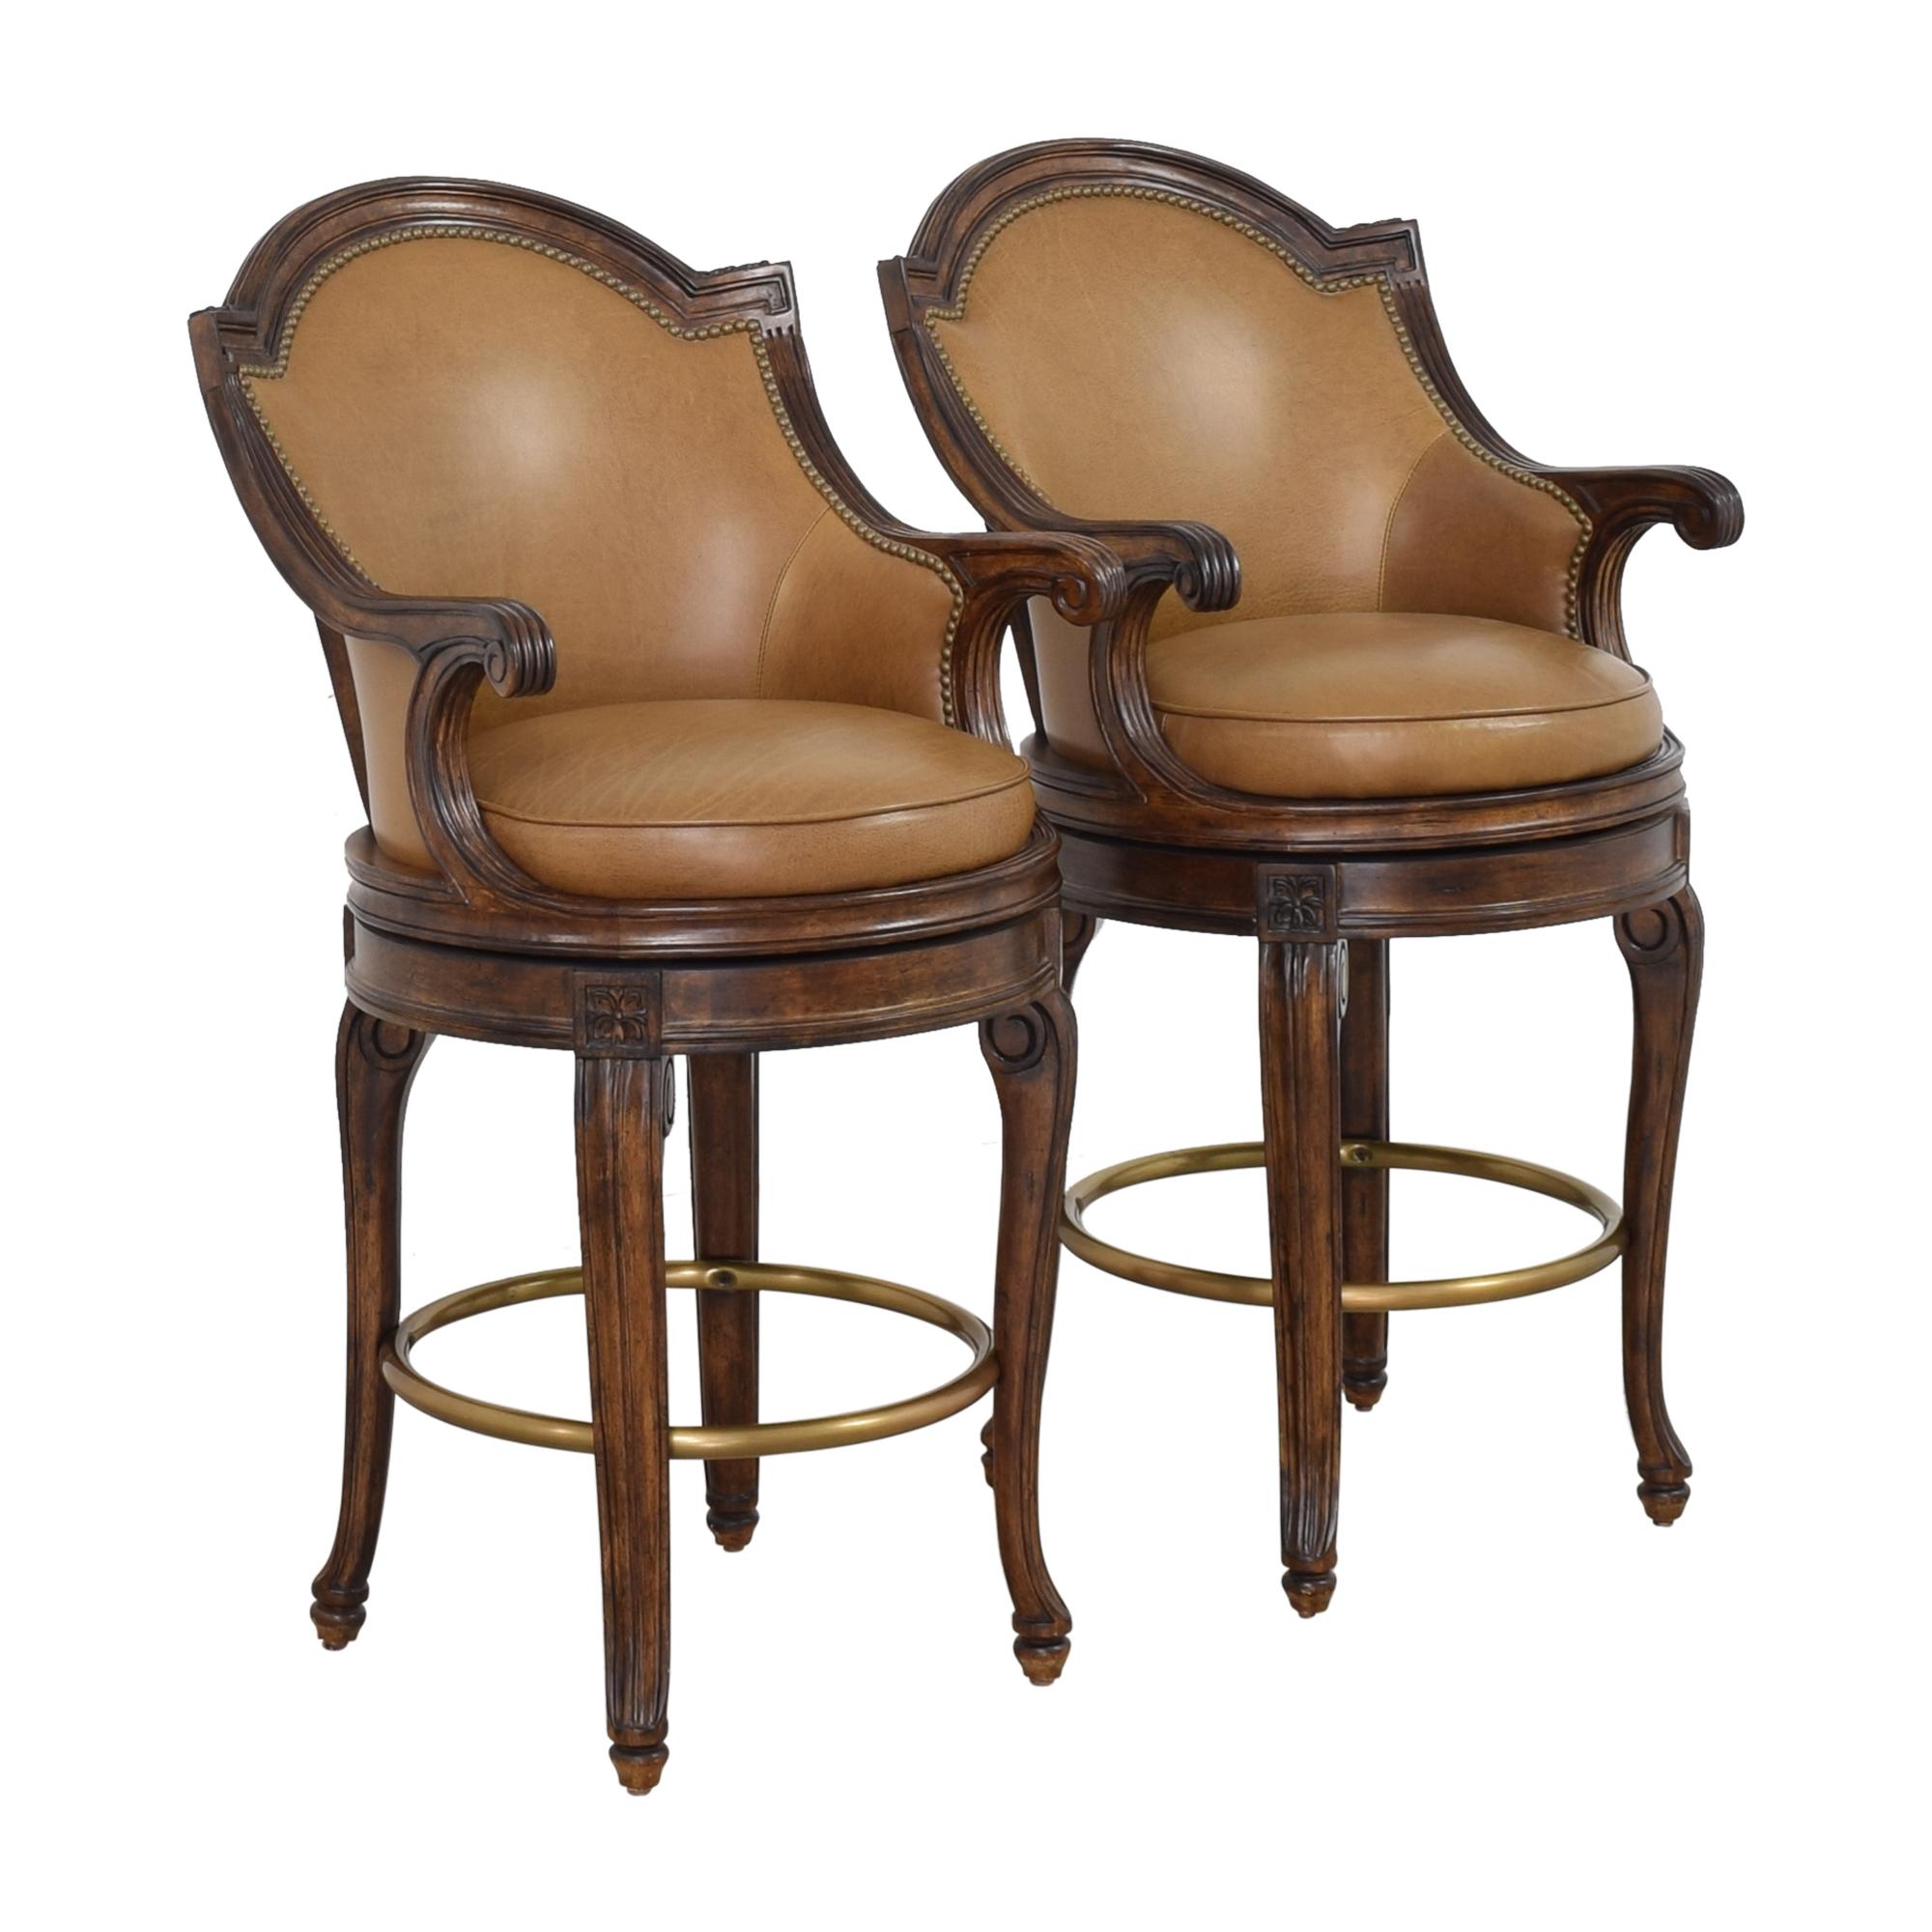 Century Furniture Century Furniture Savoy Bar Stools on sale